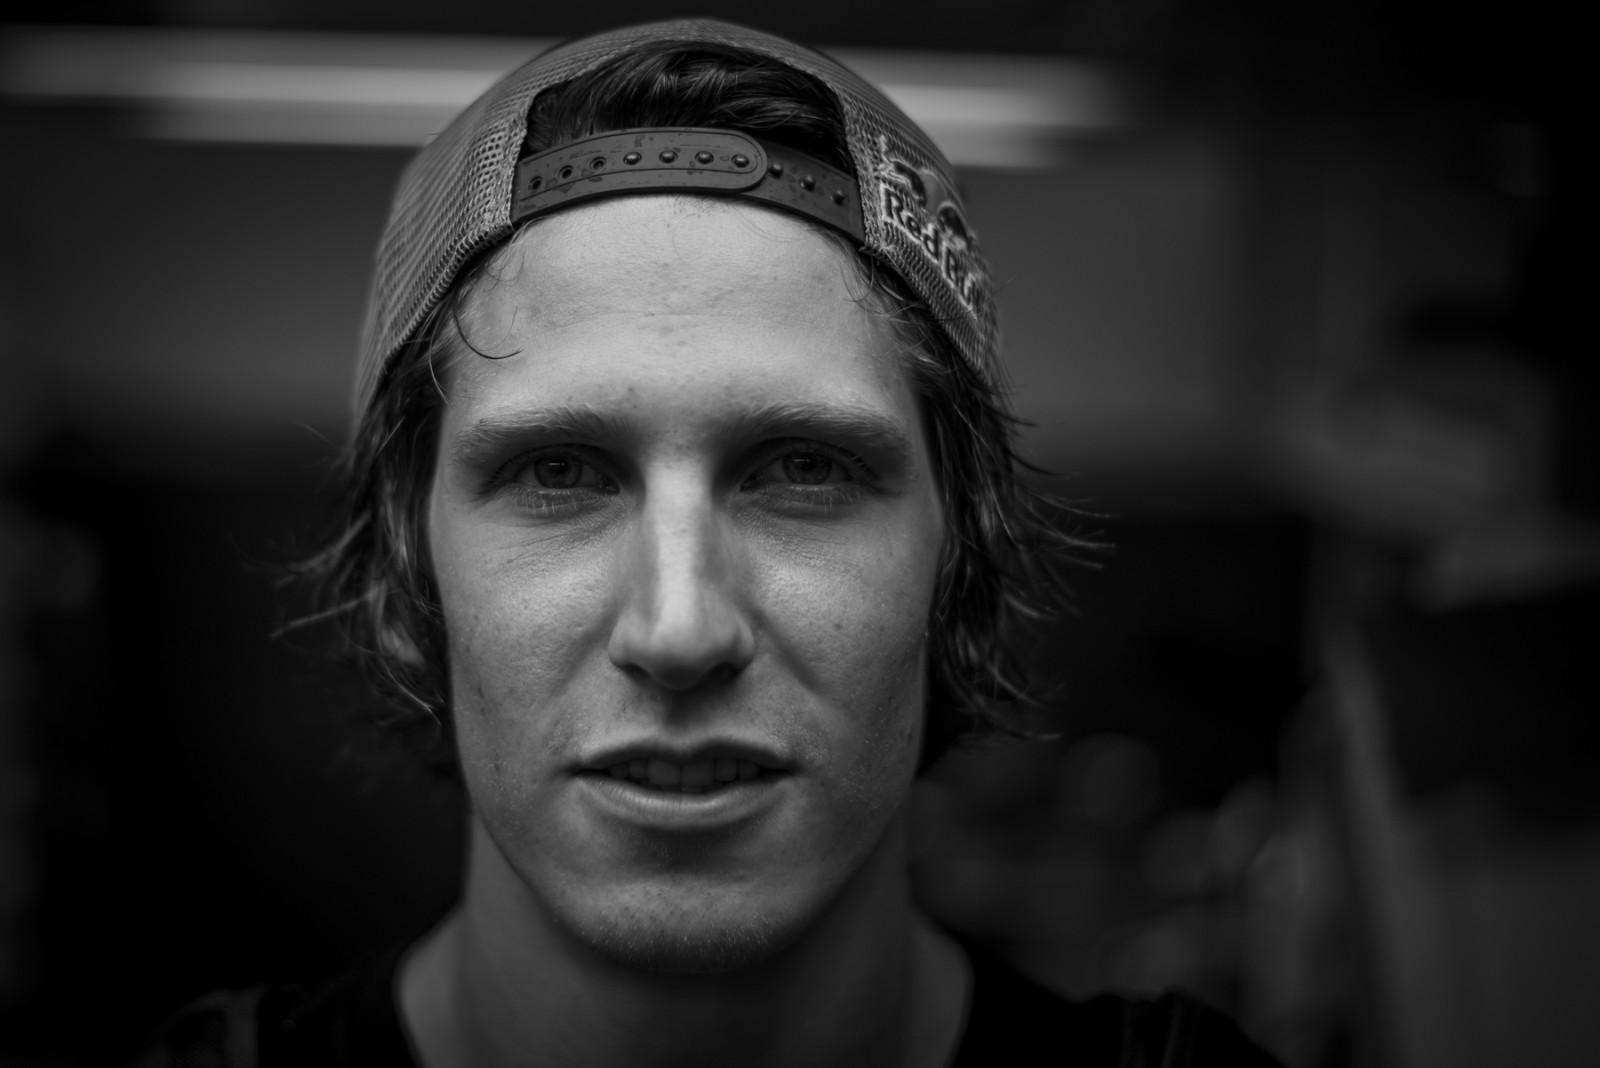 Red Bull Rampage >> 13 Monochromatic Photos of Brandon Semenuk | MTB-MAG.COM